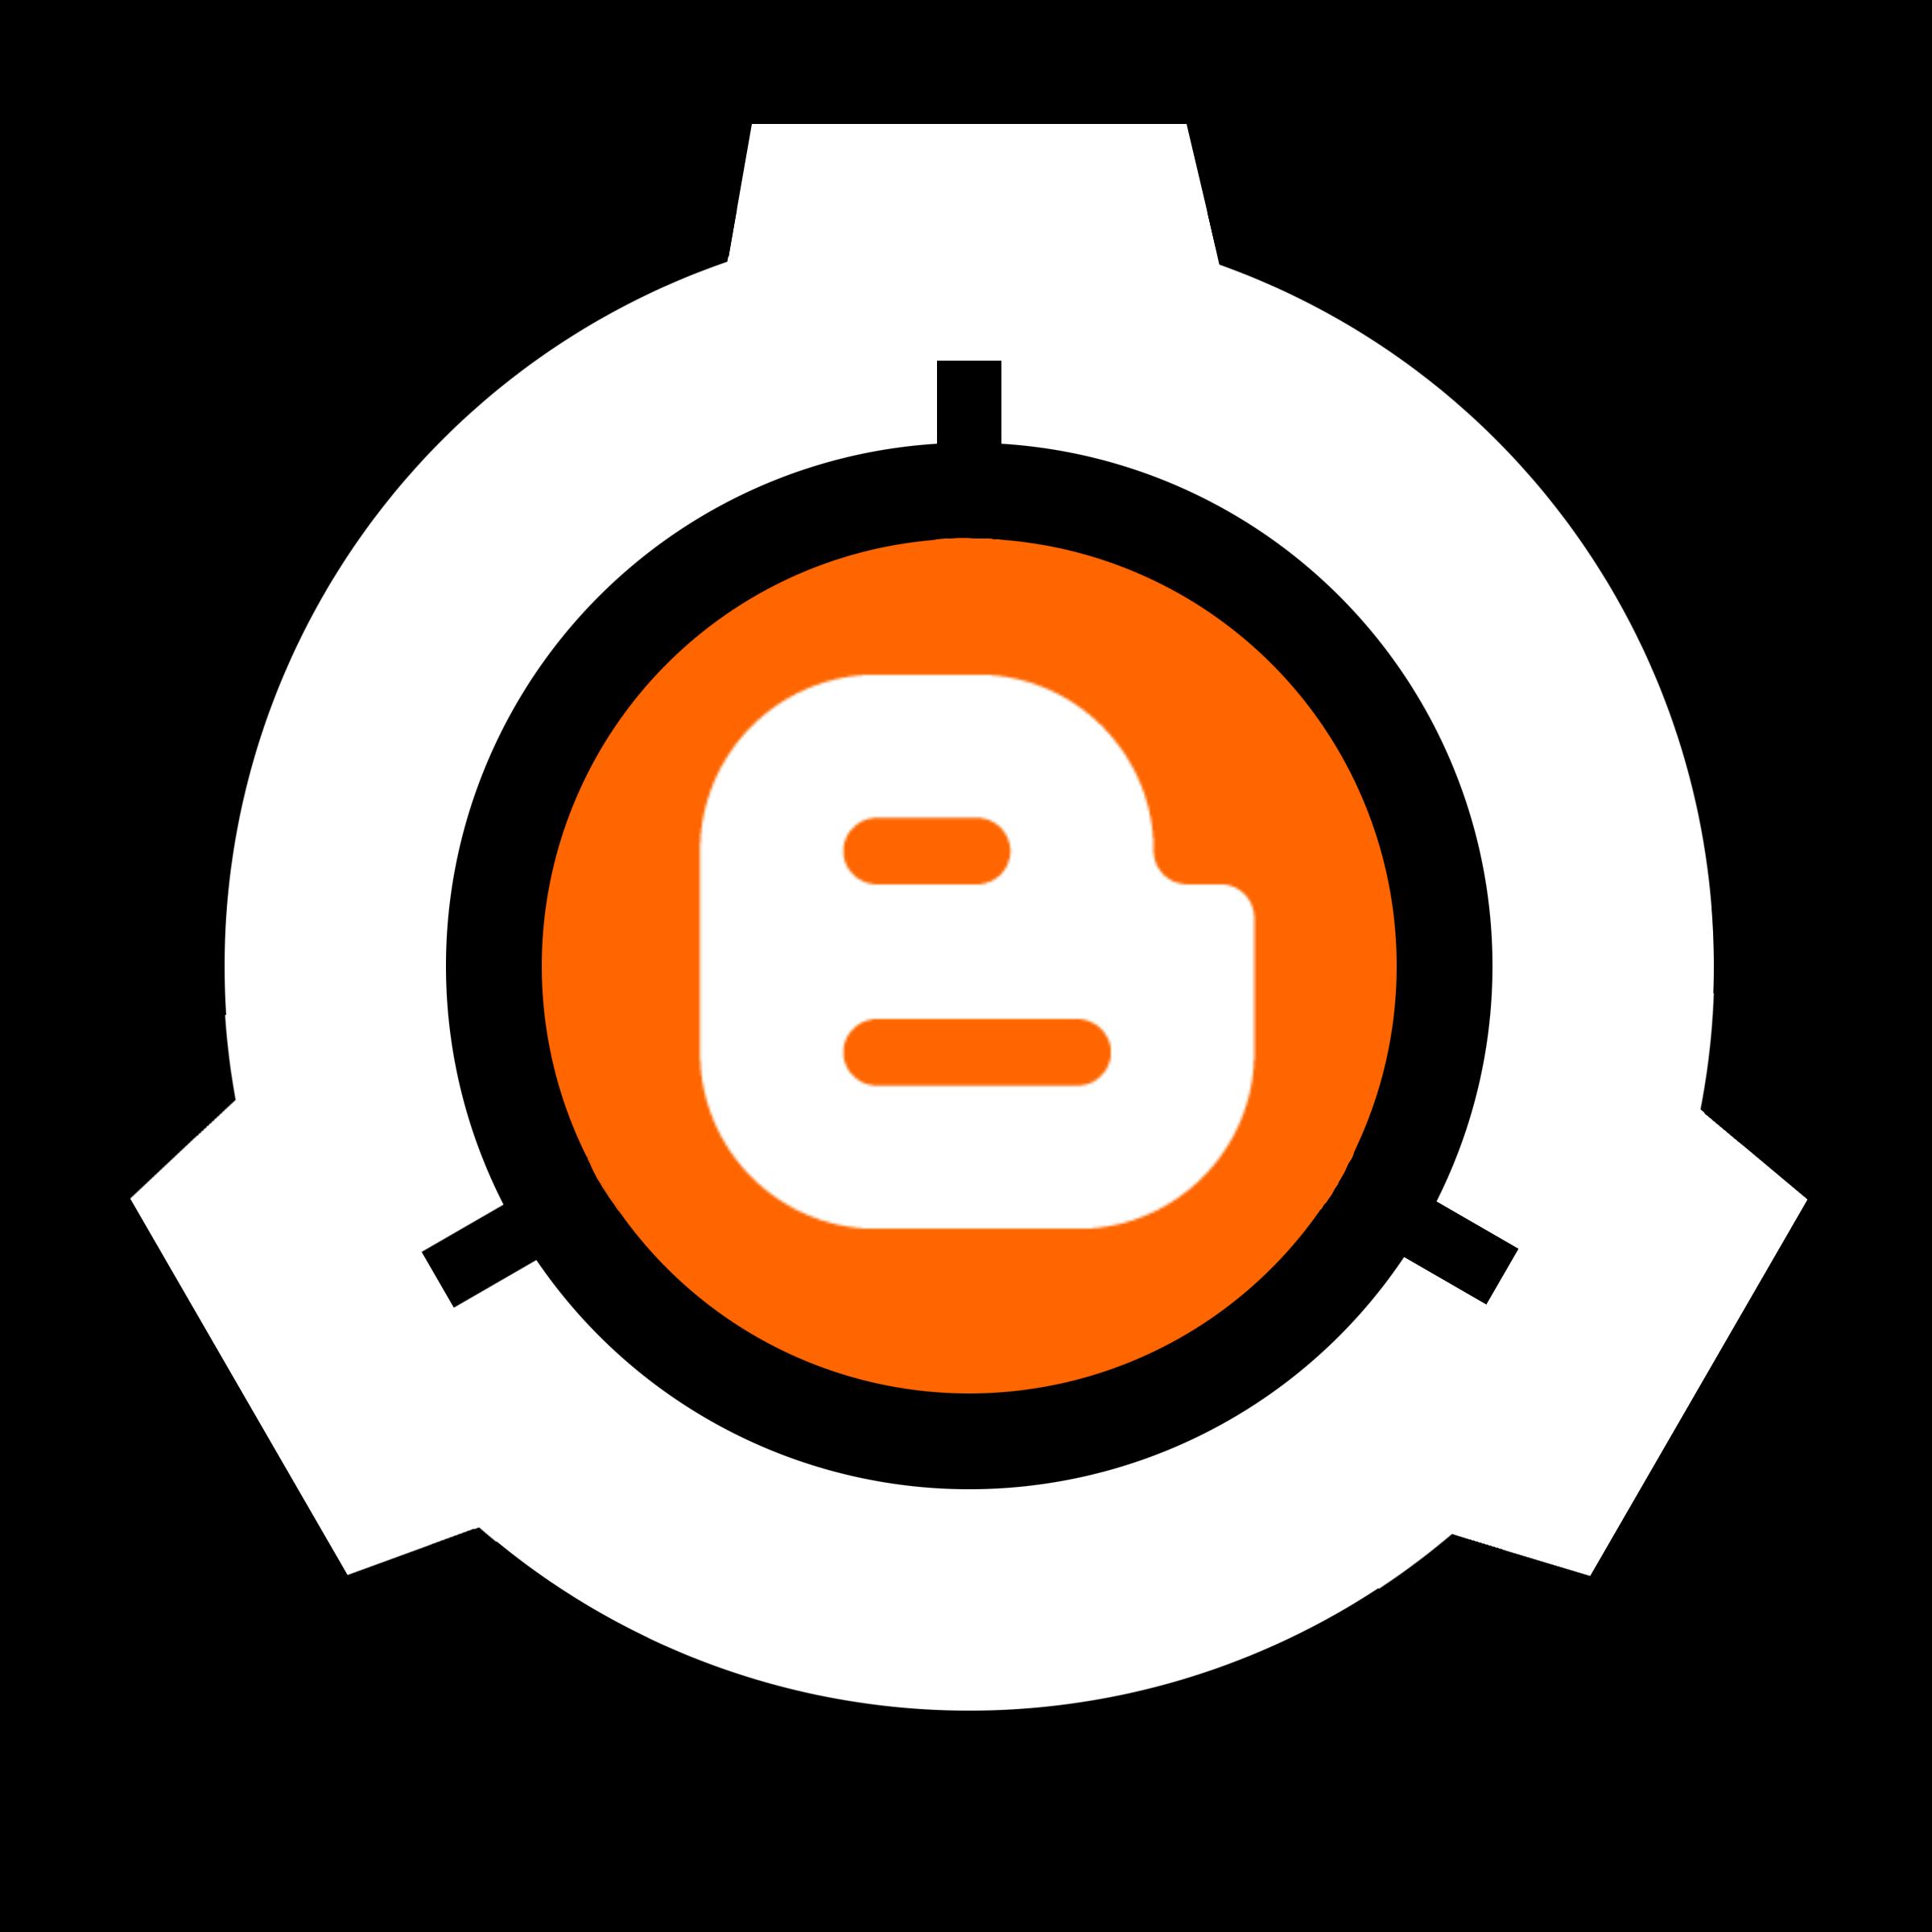 icon-googleblog.png